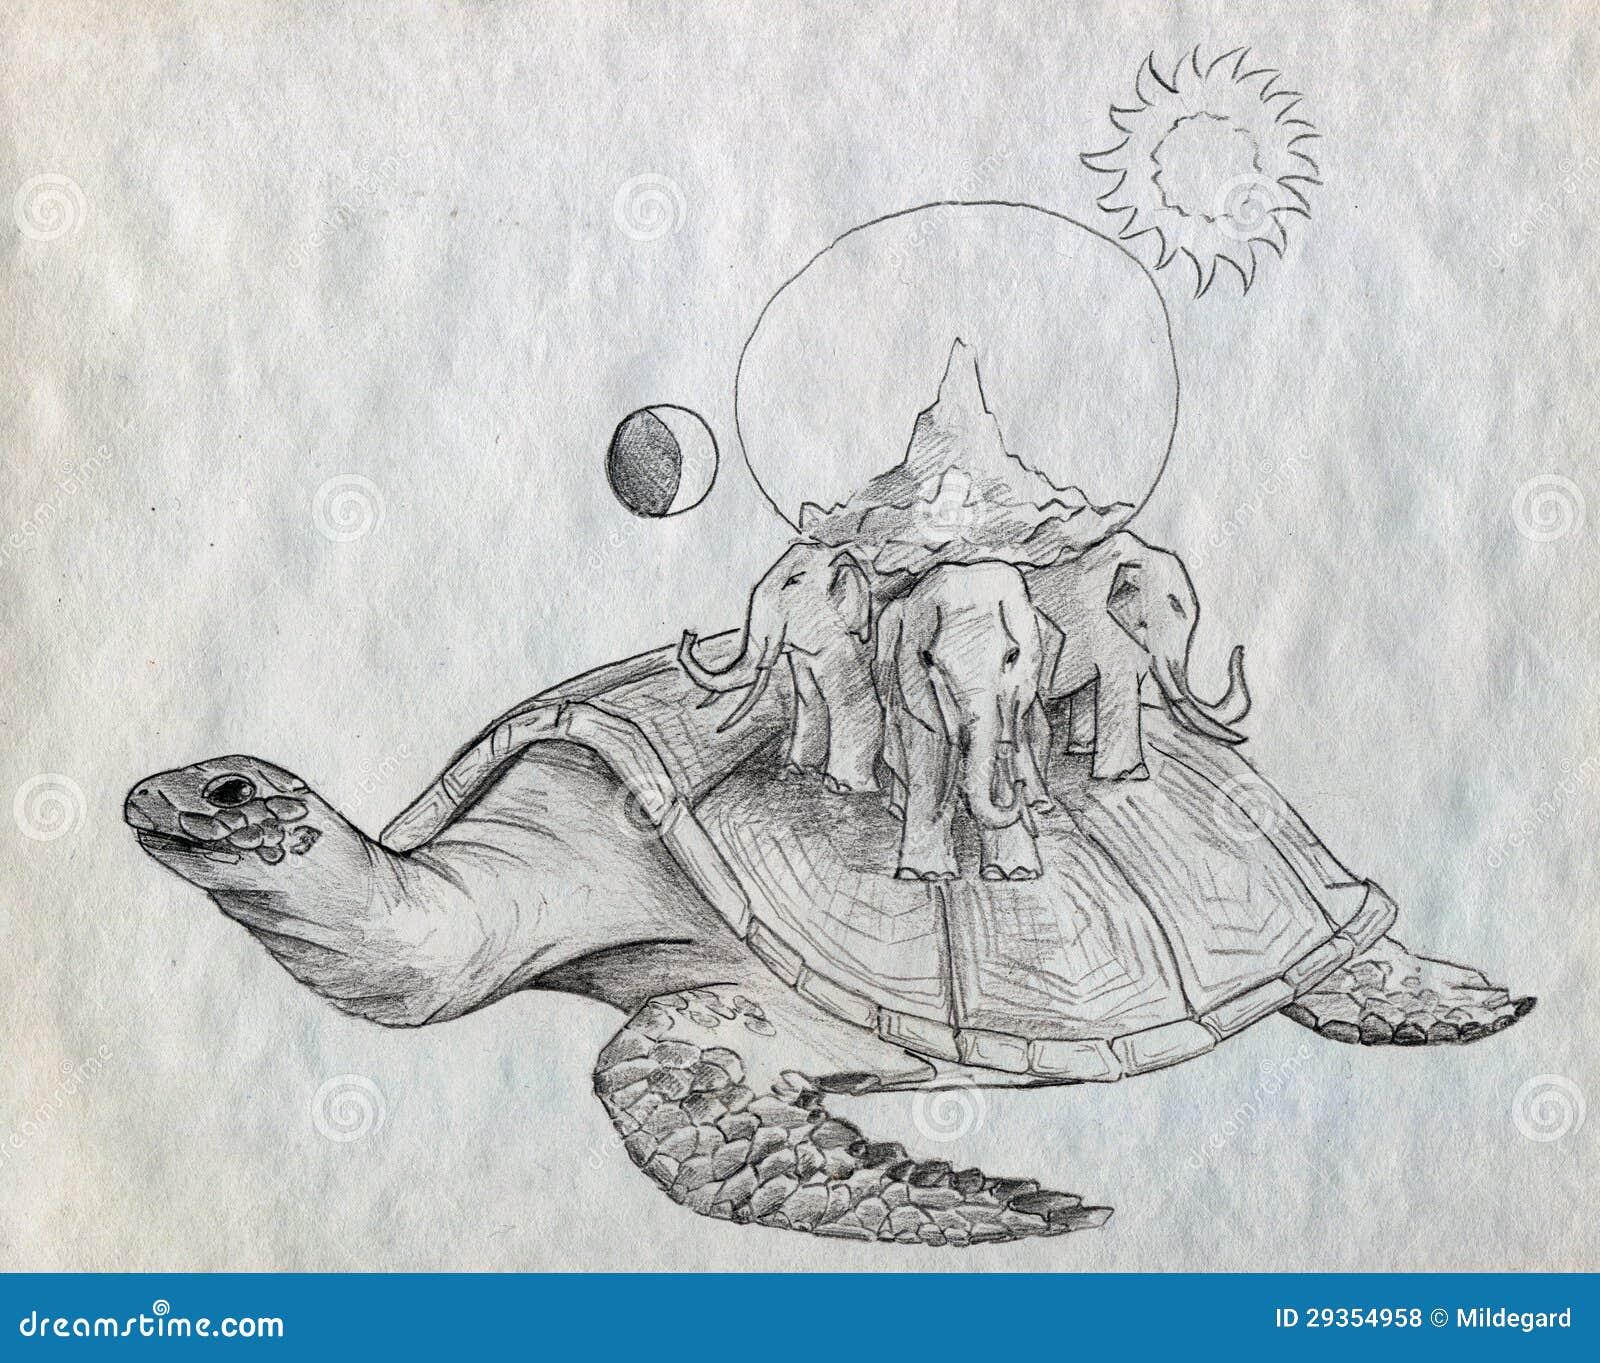 Земля на слонах и черепаха рисунок